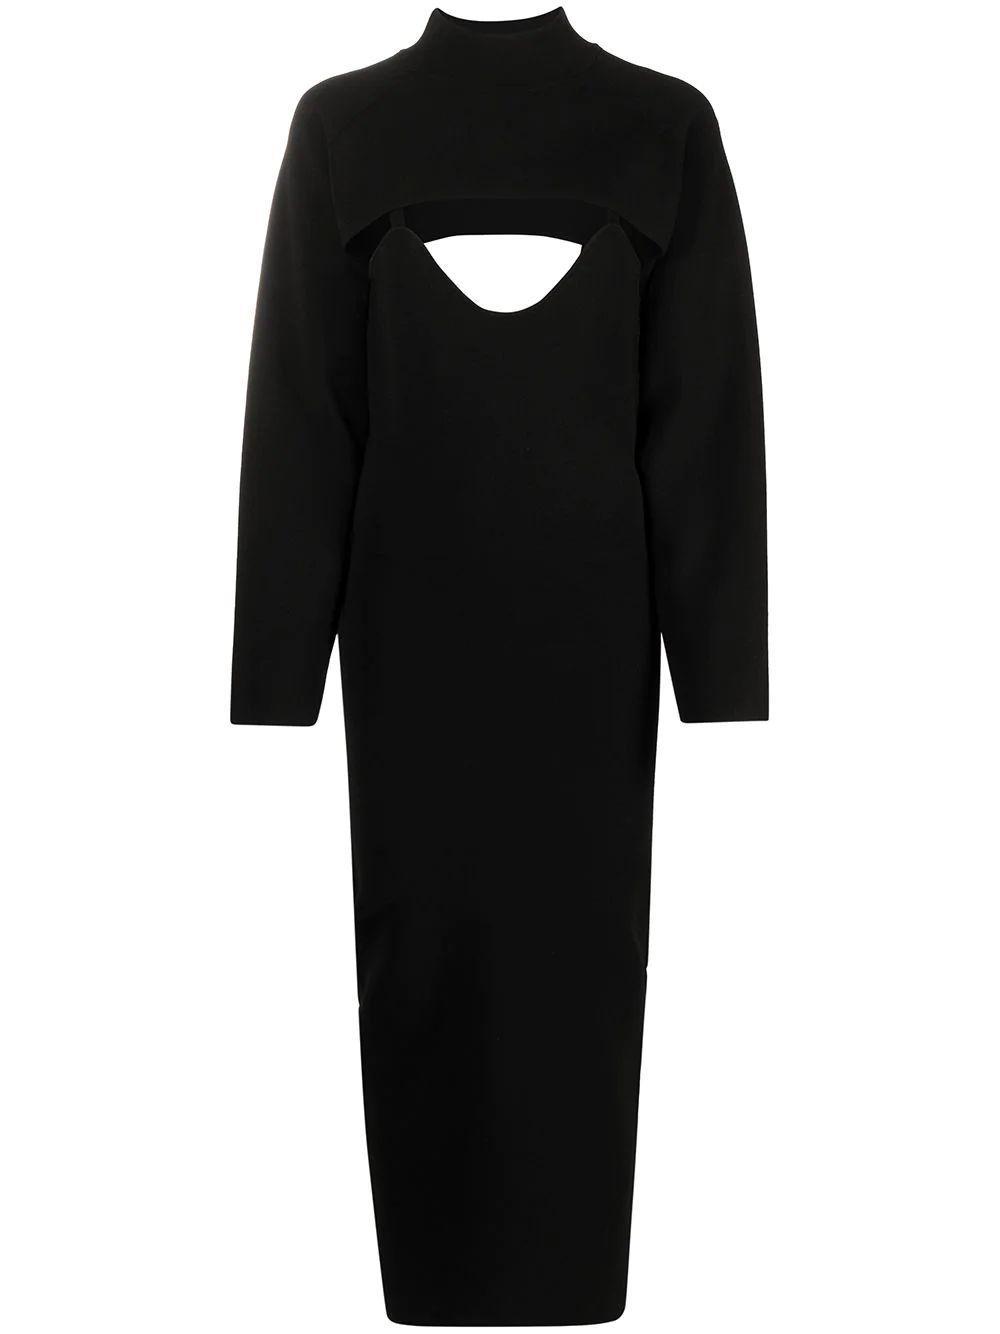 Noa Cutout Knit Dress Item # NW21PFDR01299